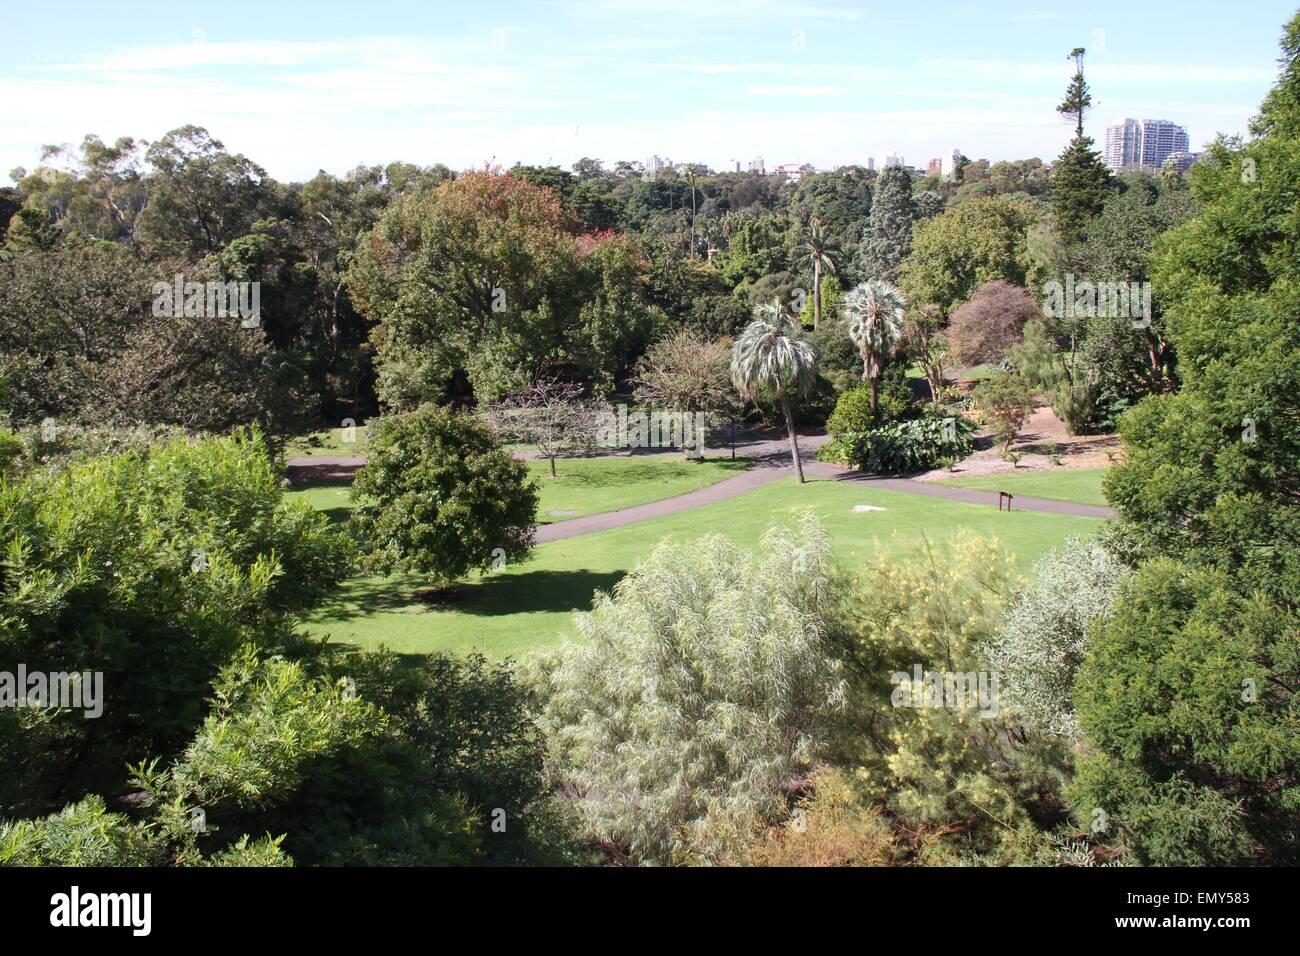 Sydney, Australia. 24 April 2015. The Royal Botanic Garden. Credit: Richard Milnes/Alamy Stock Photo